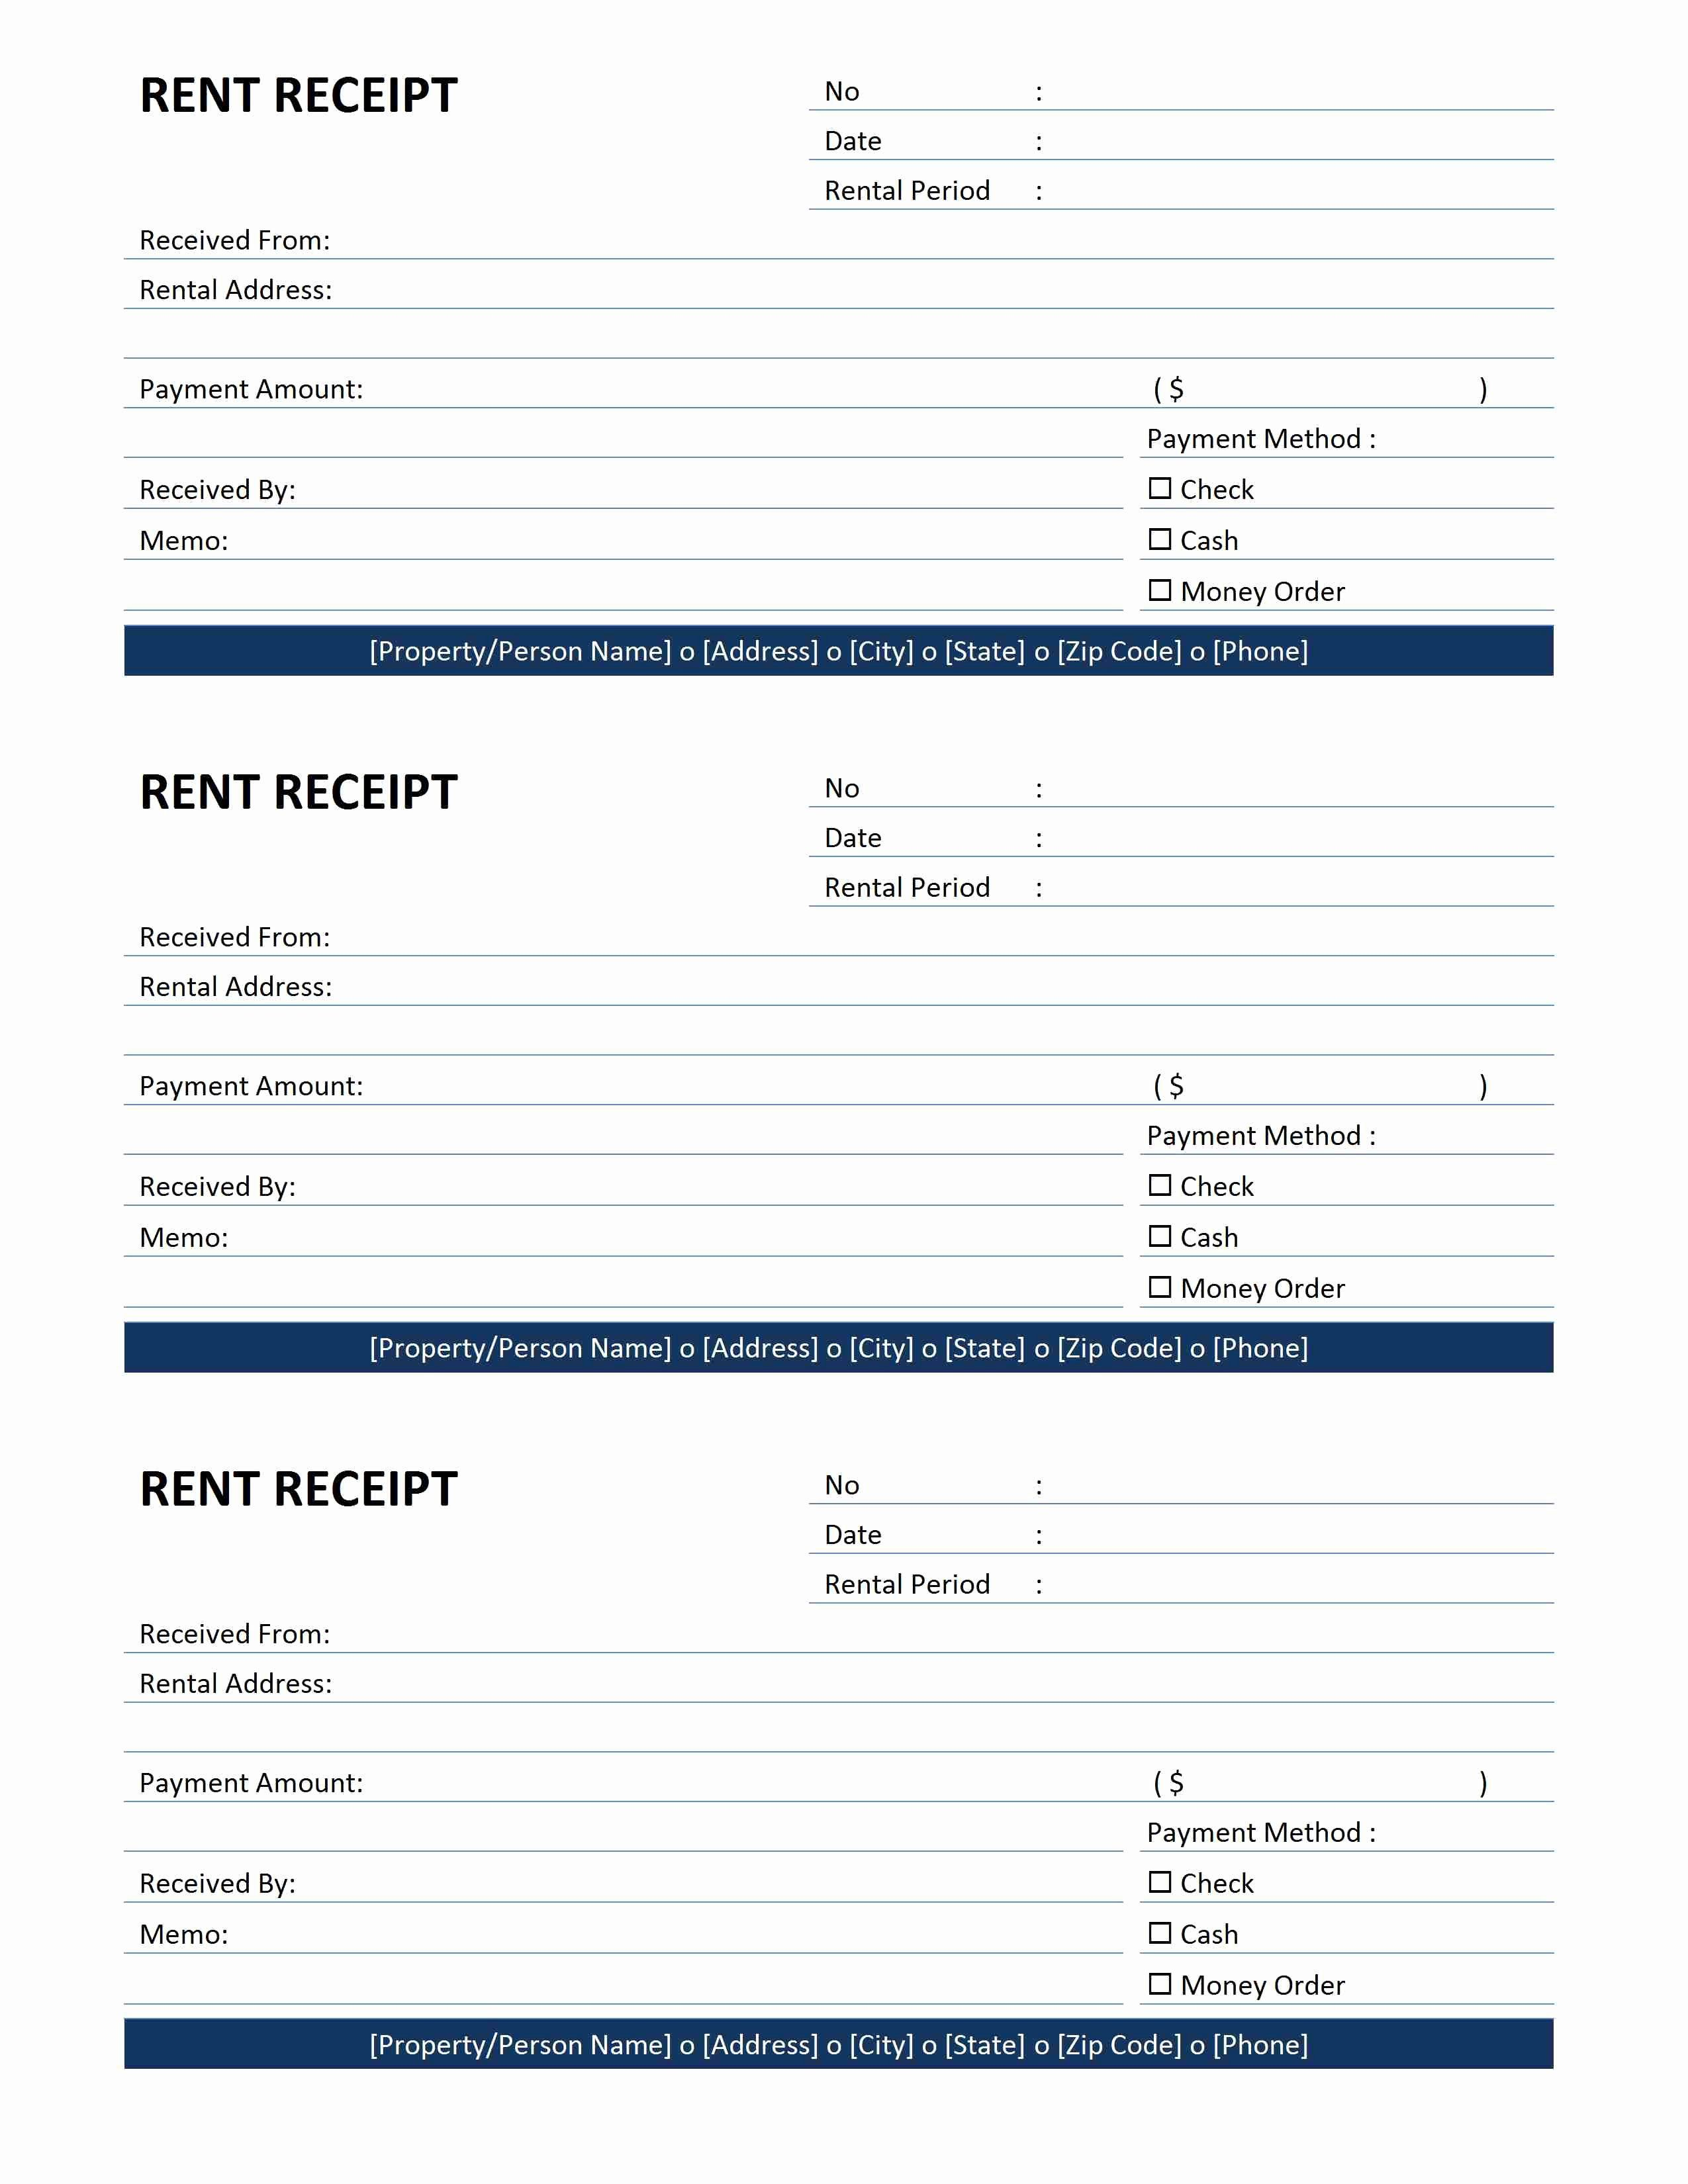 Fake Utility Bill Template Unique Fake Documents Fake Bank Statements Fake Utility Bills Peterai Receipt Template Free Receipt Template Invoice Template Word